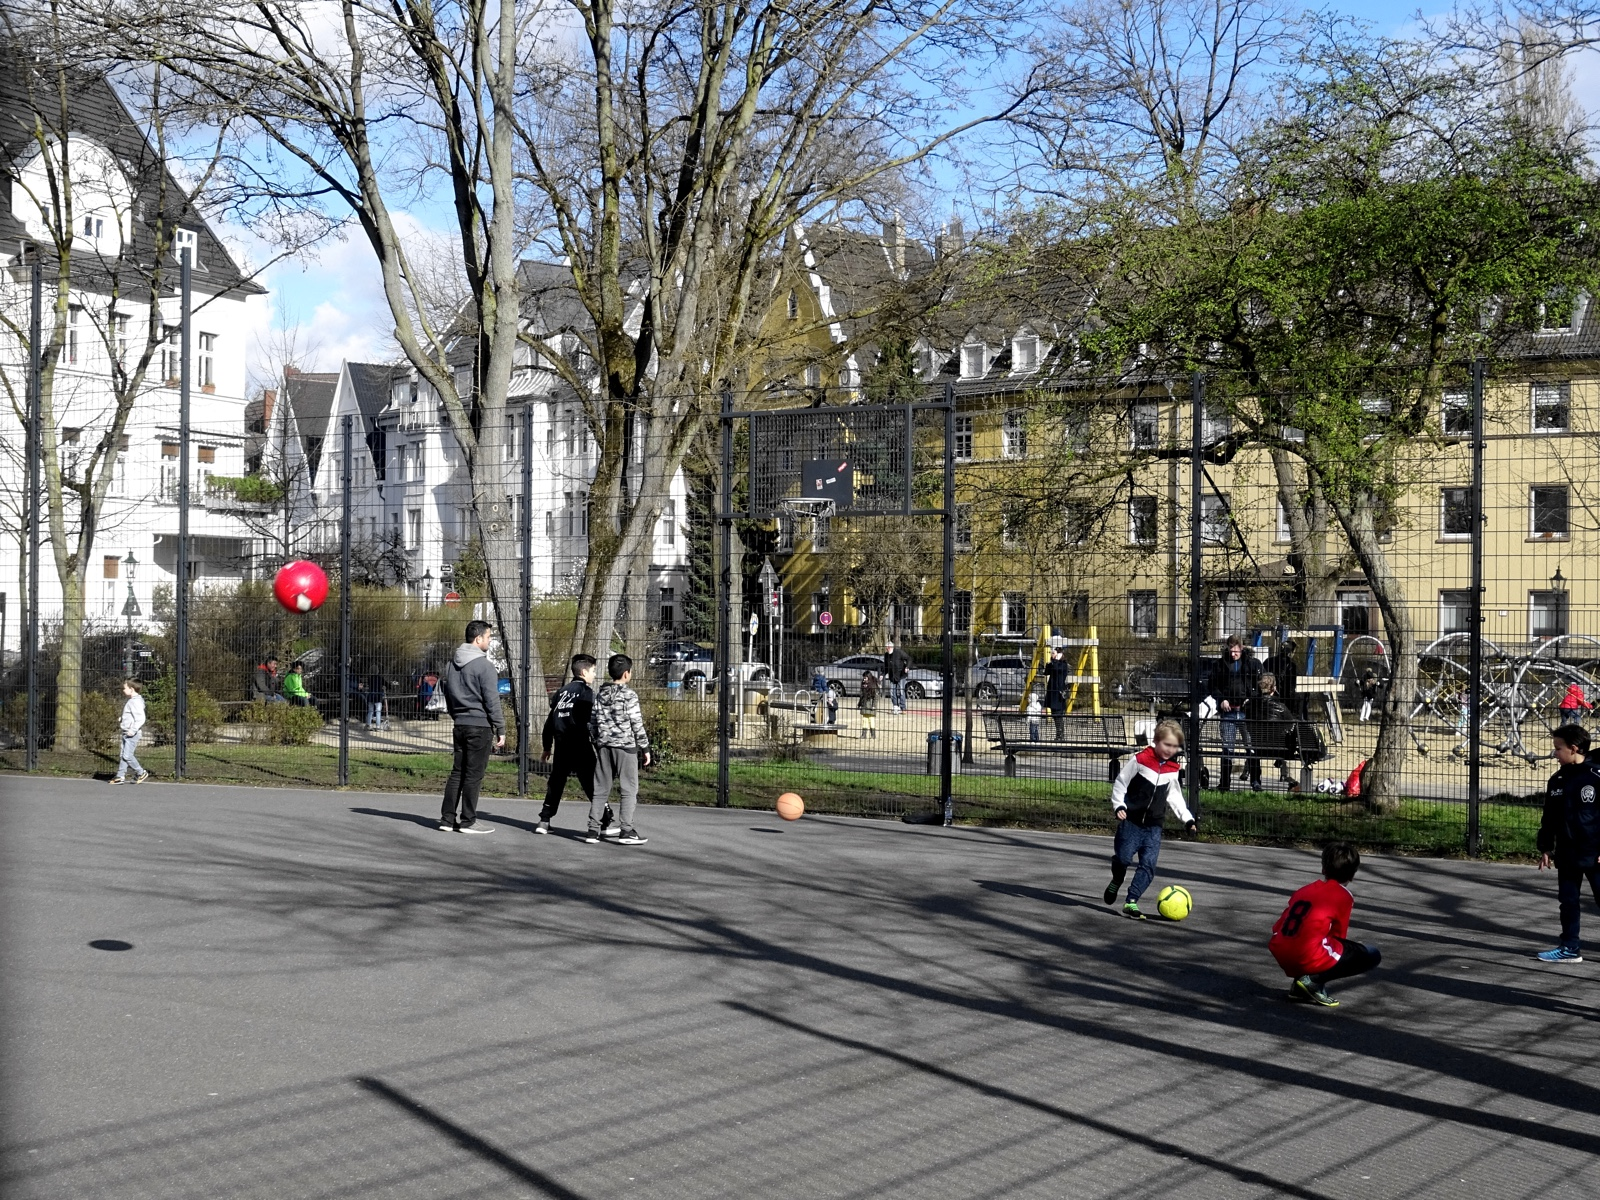 Streetball in Oberkassel.